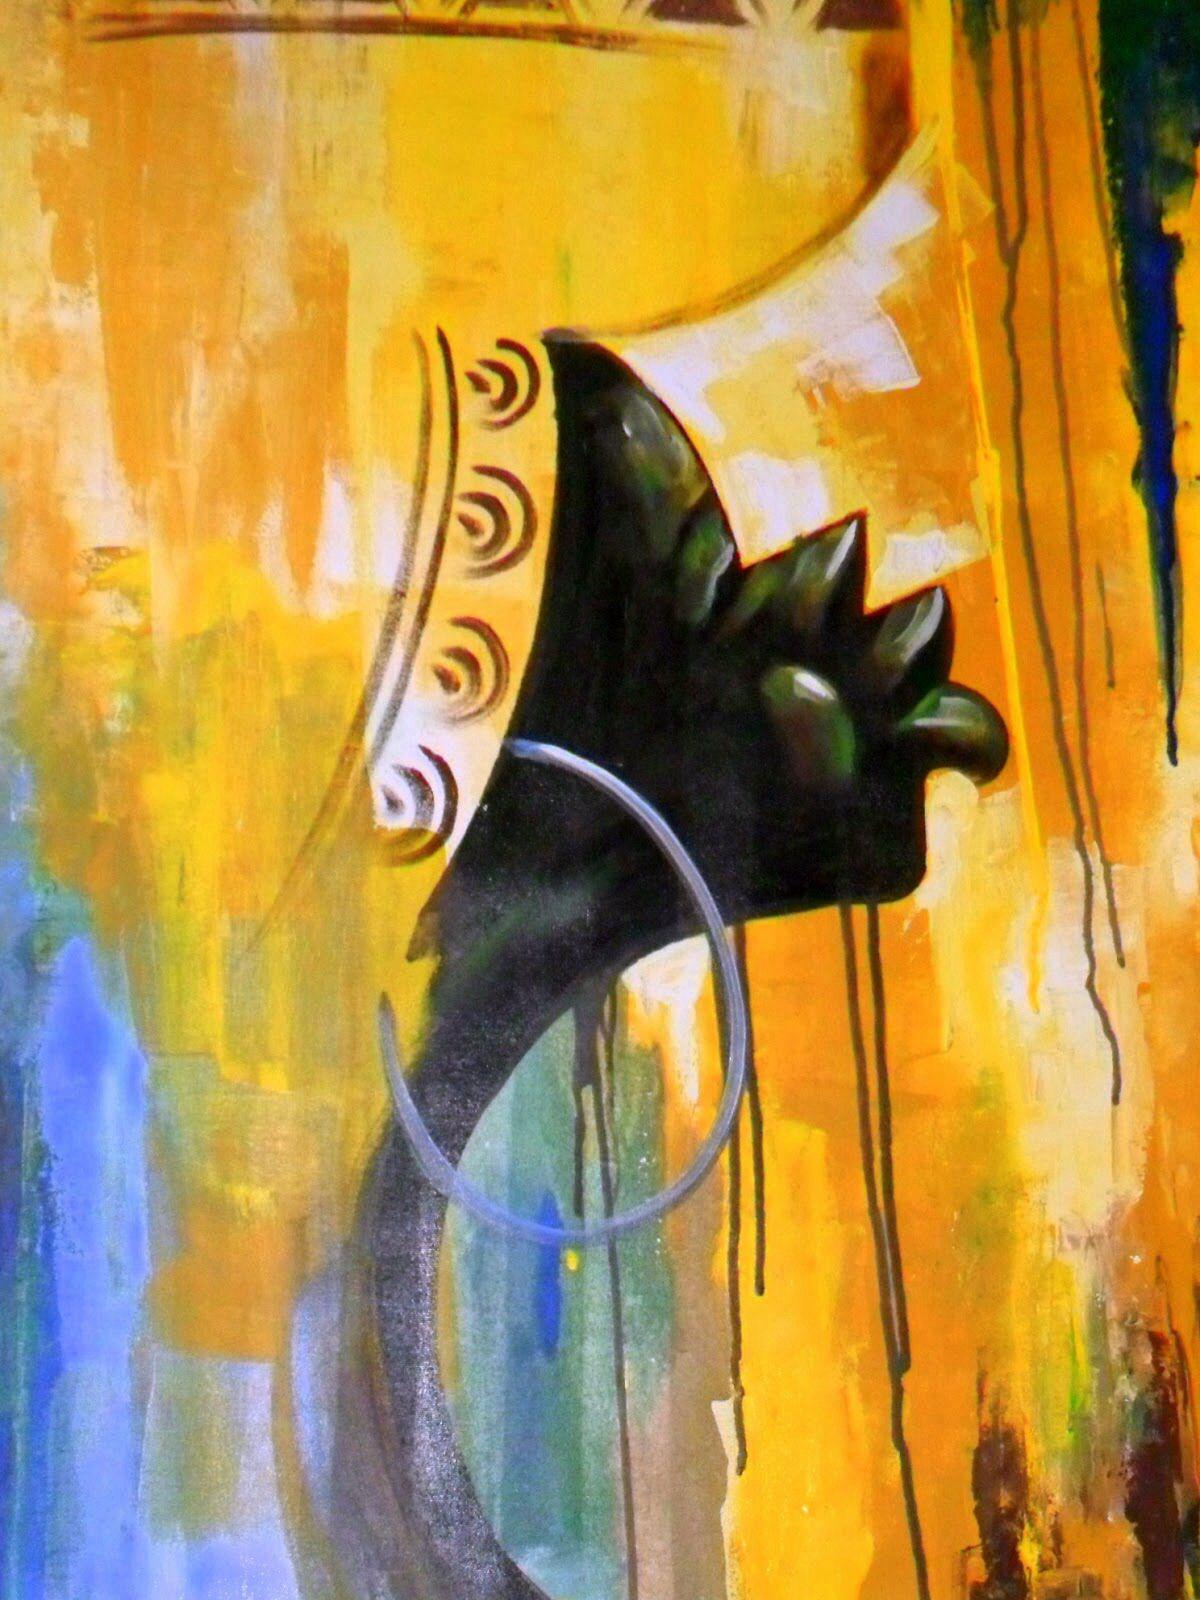 African Art | morena | Pinterest | African art, Africans and African ...